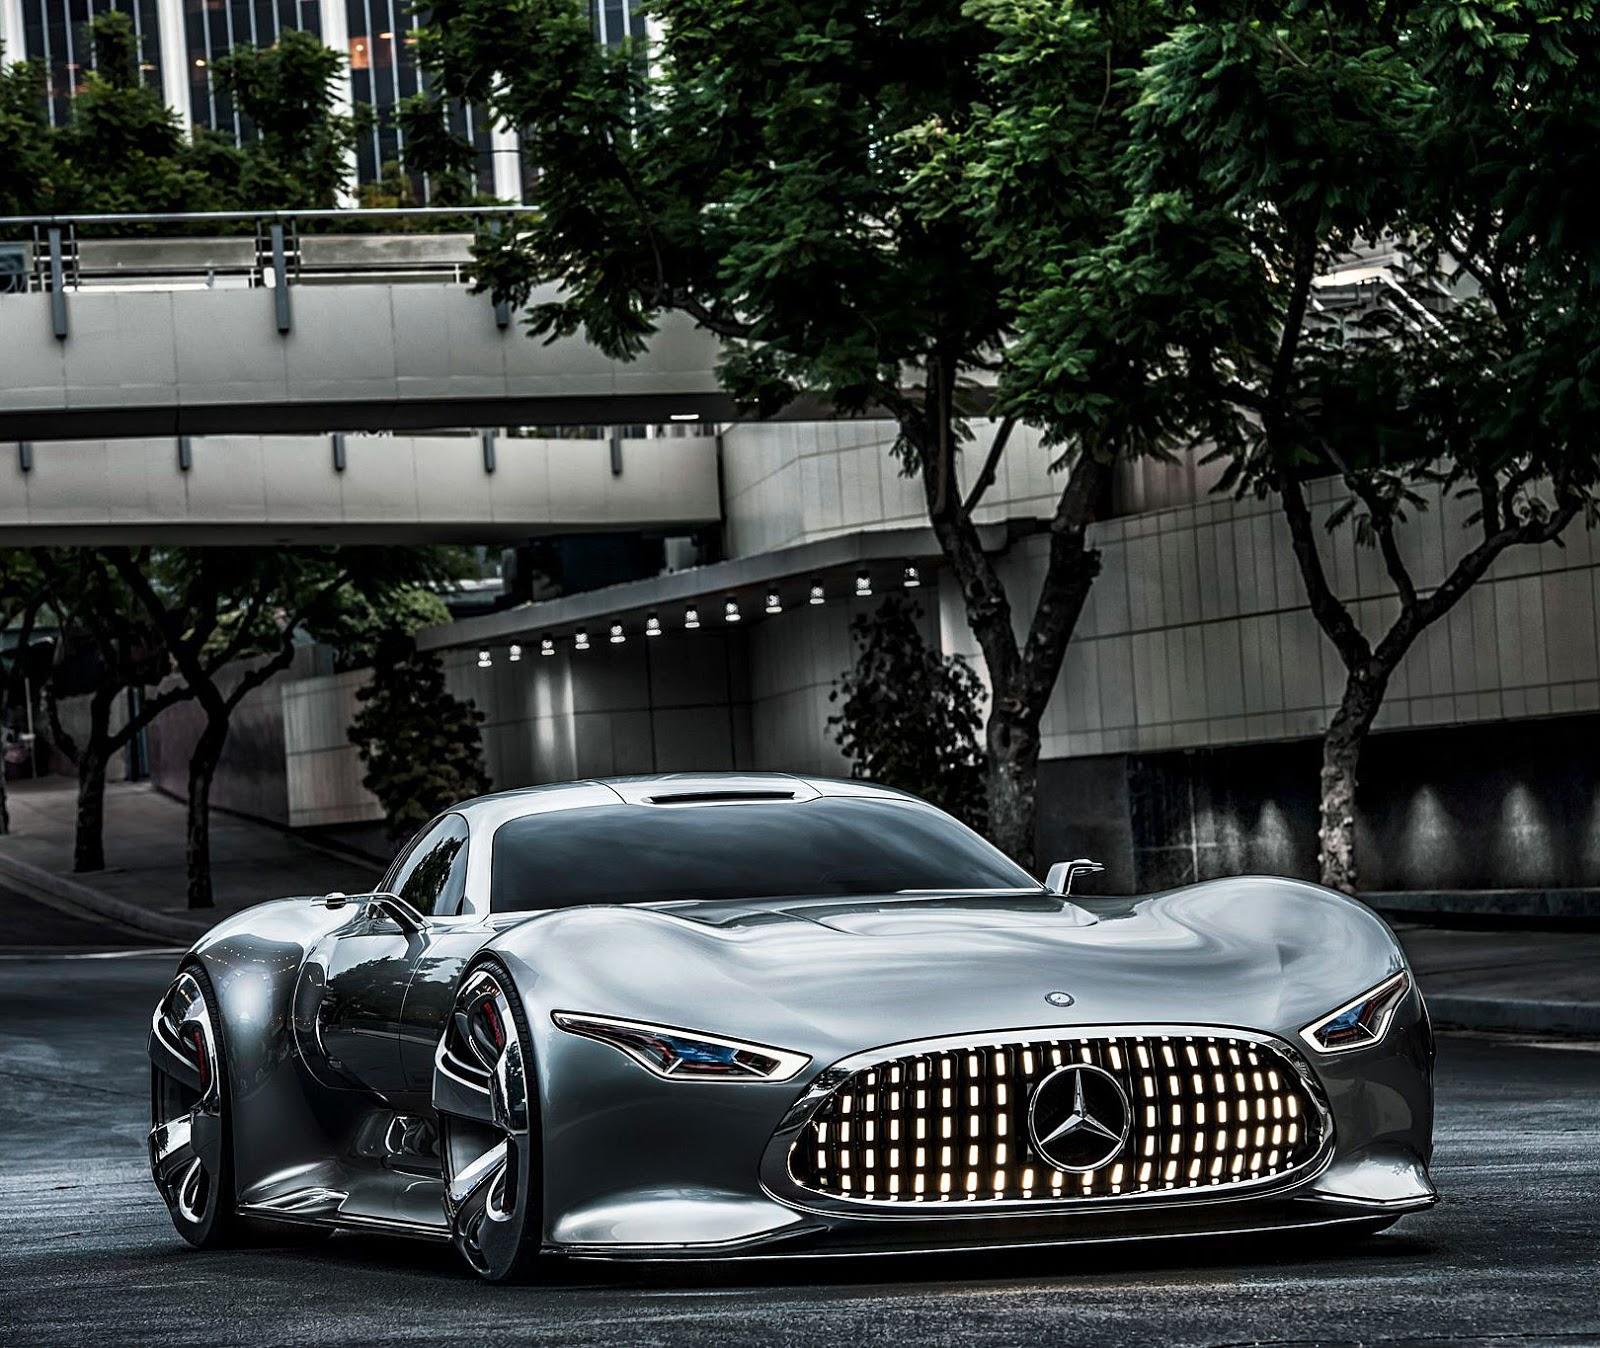 Jake's Car World: Mercedes-Benz AMG Vision Concept